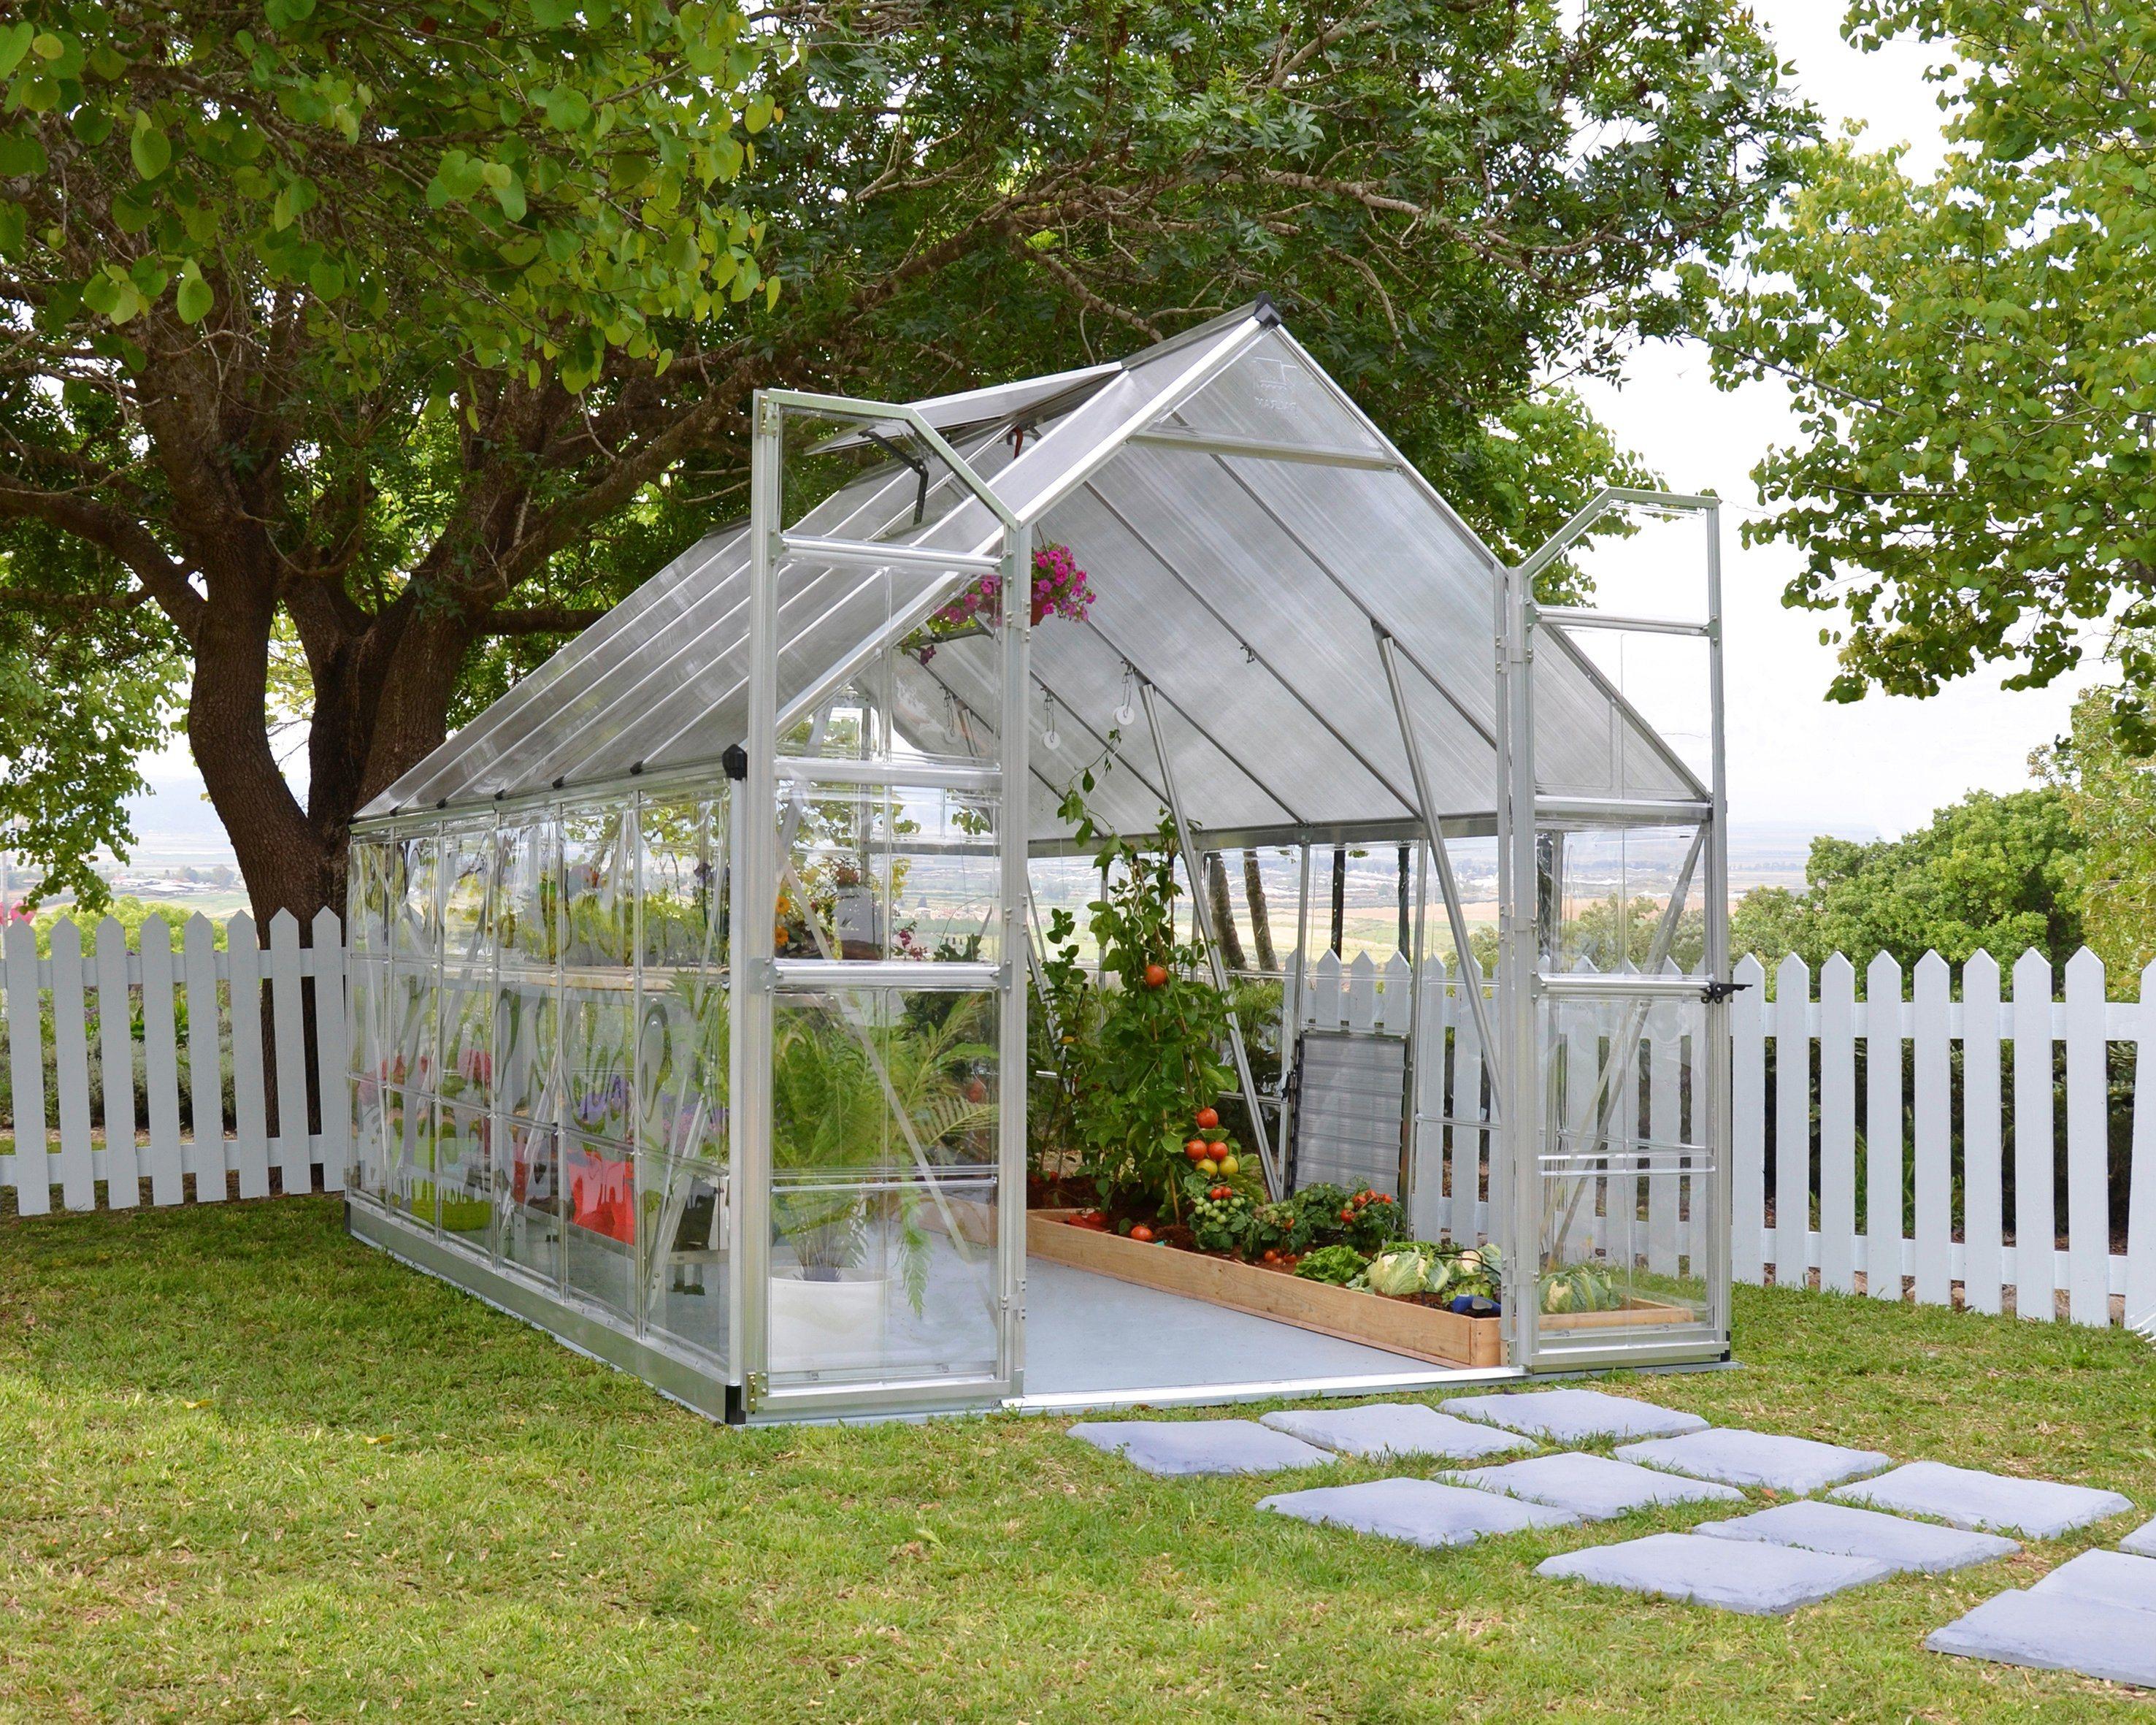 PALRAM Gewächshaus »Balance«, B/T/H: 244/367/299 cm, silberfarben | Garten > Gewächshäuser | Polycarbonat | Palram